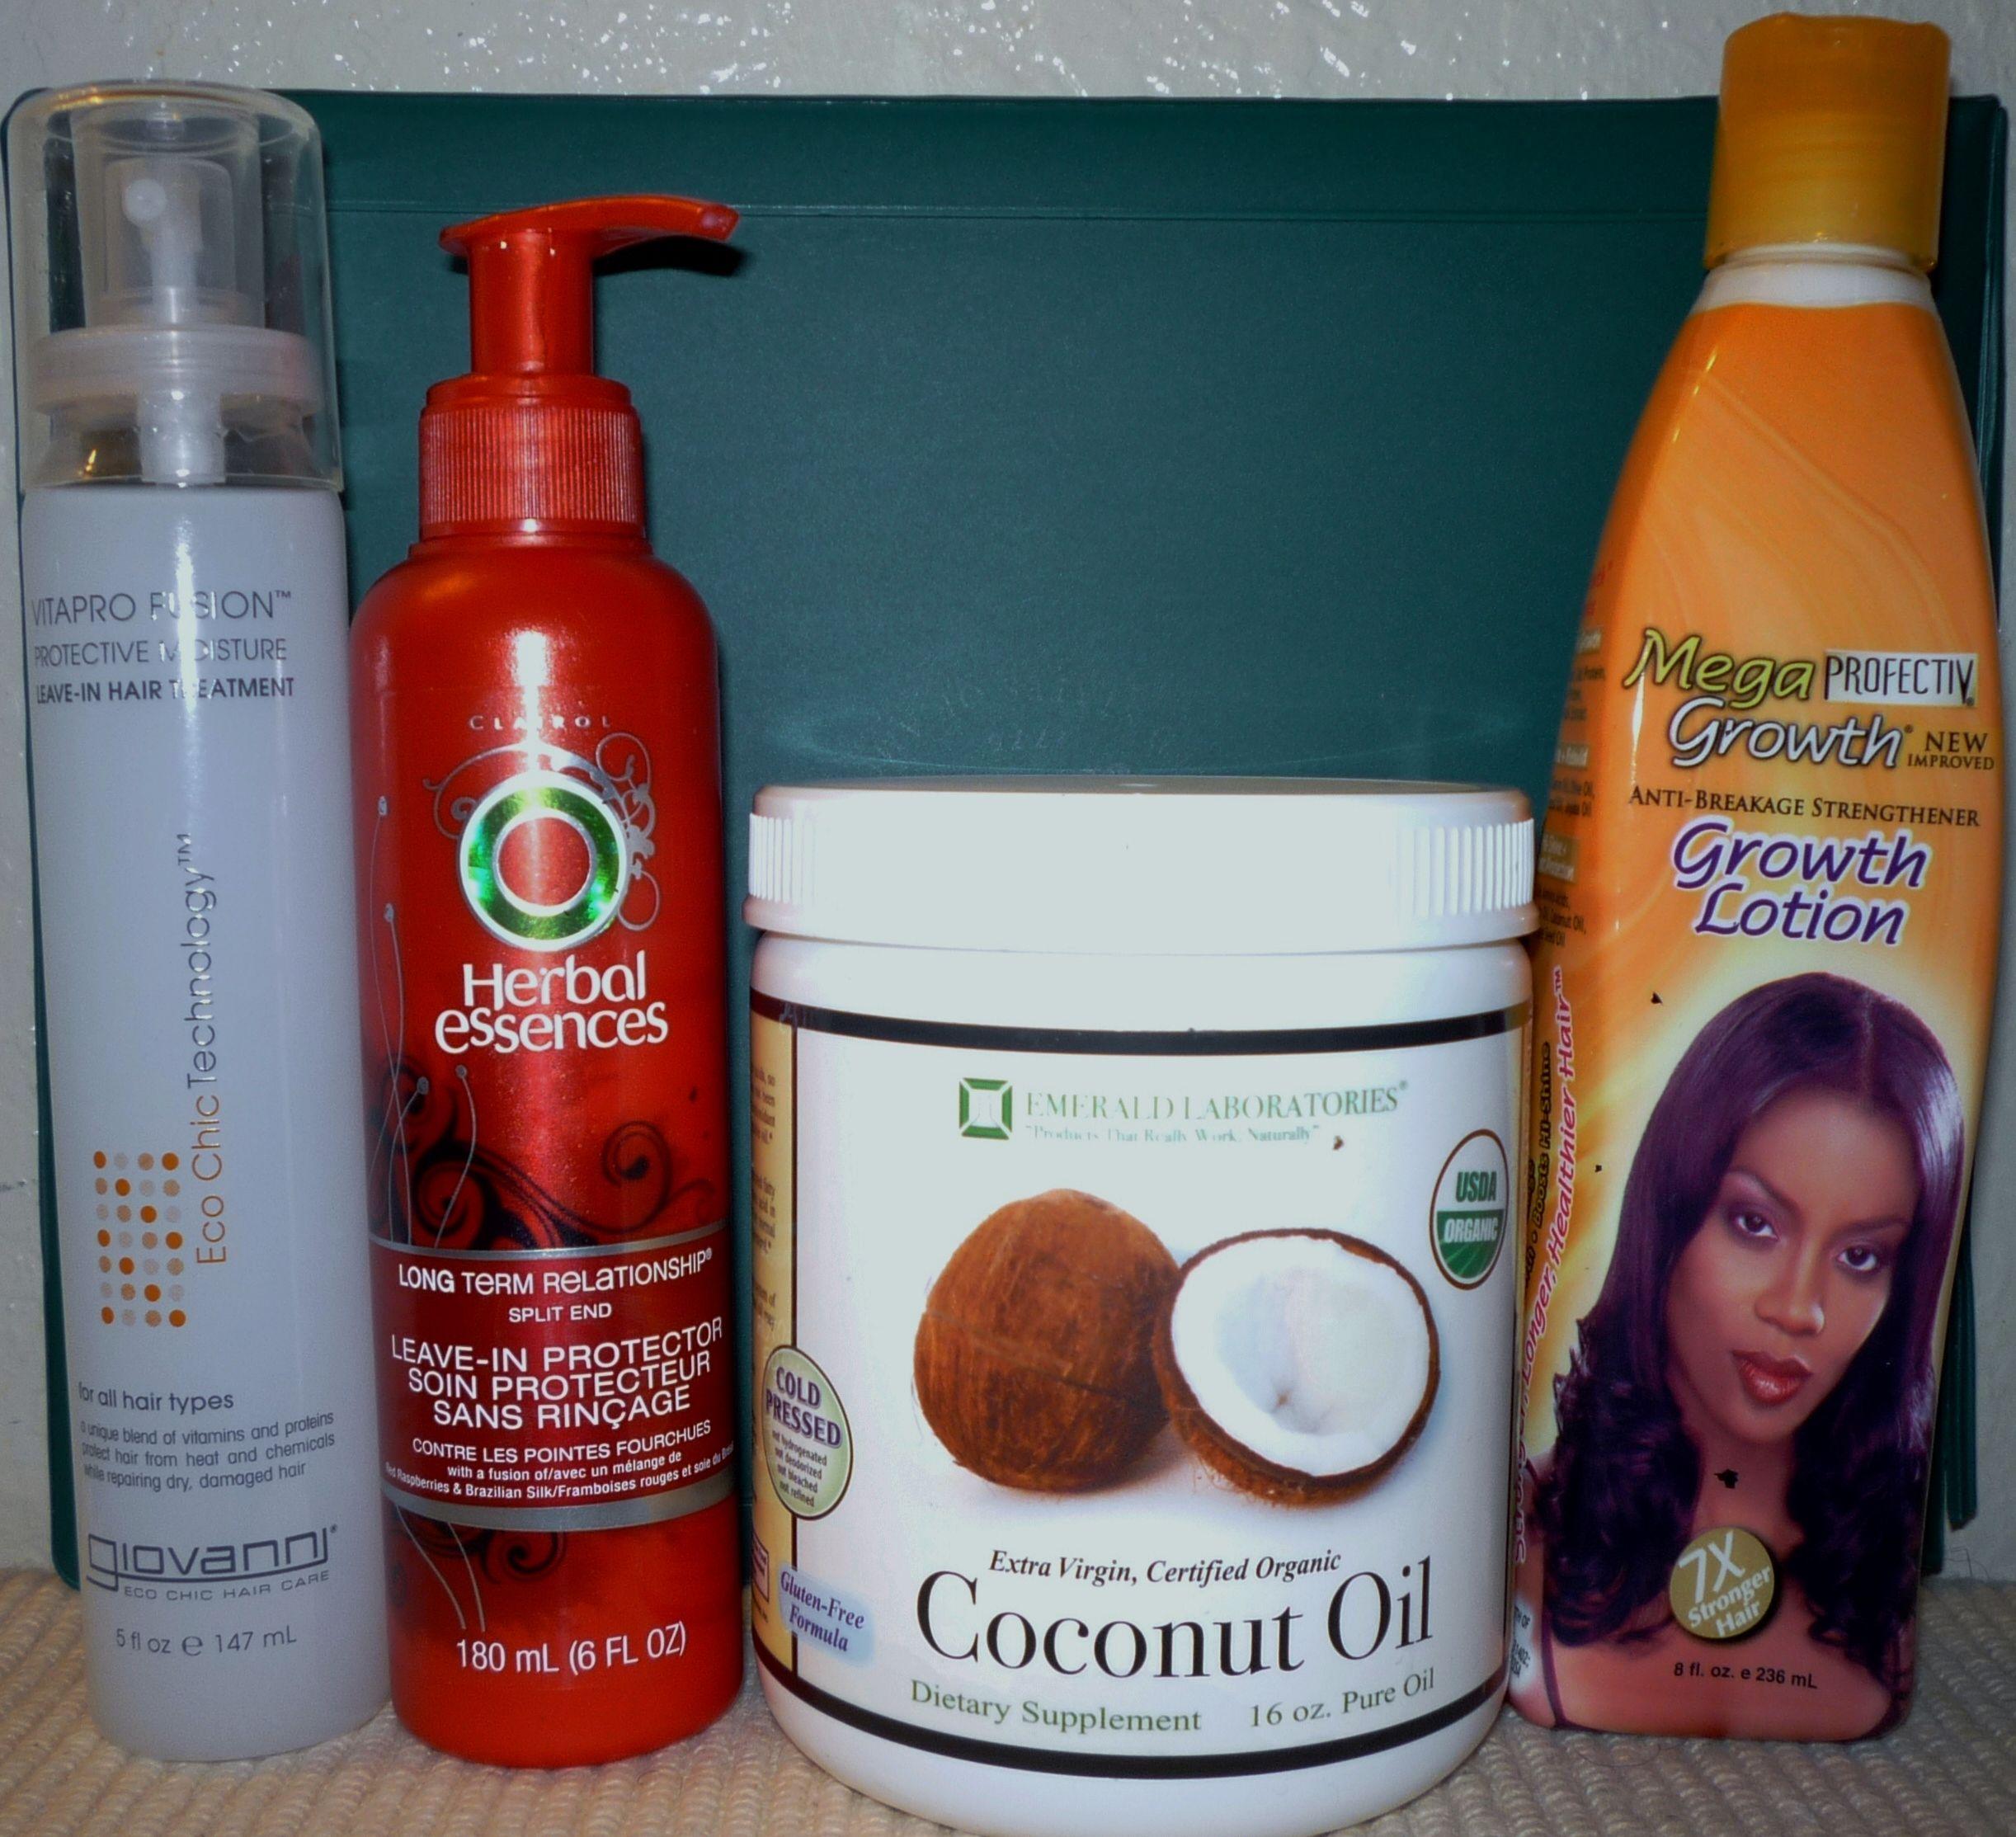 Great moisturizers